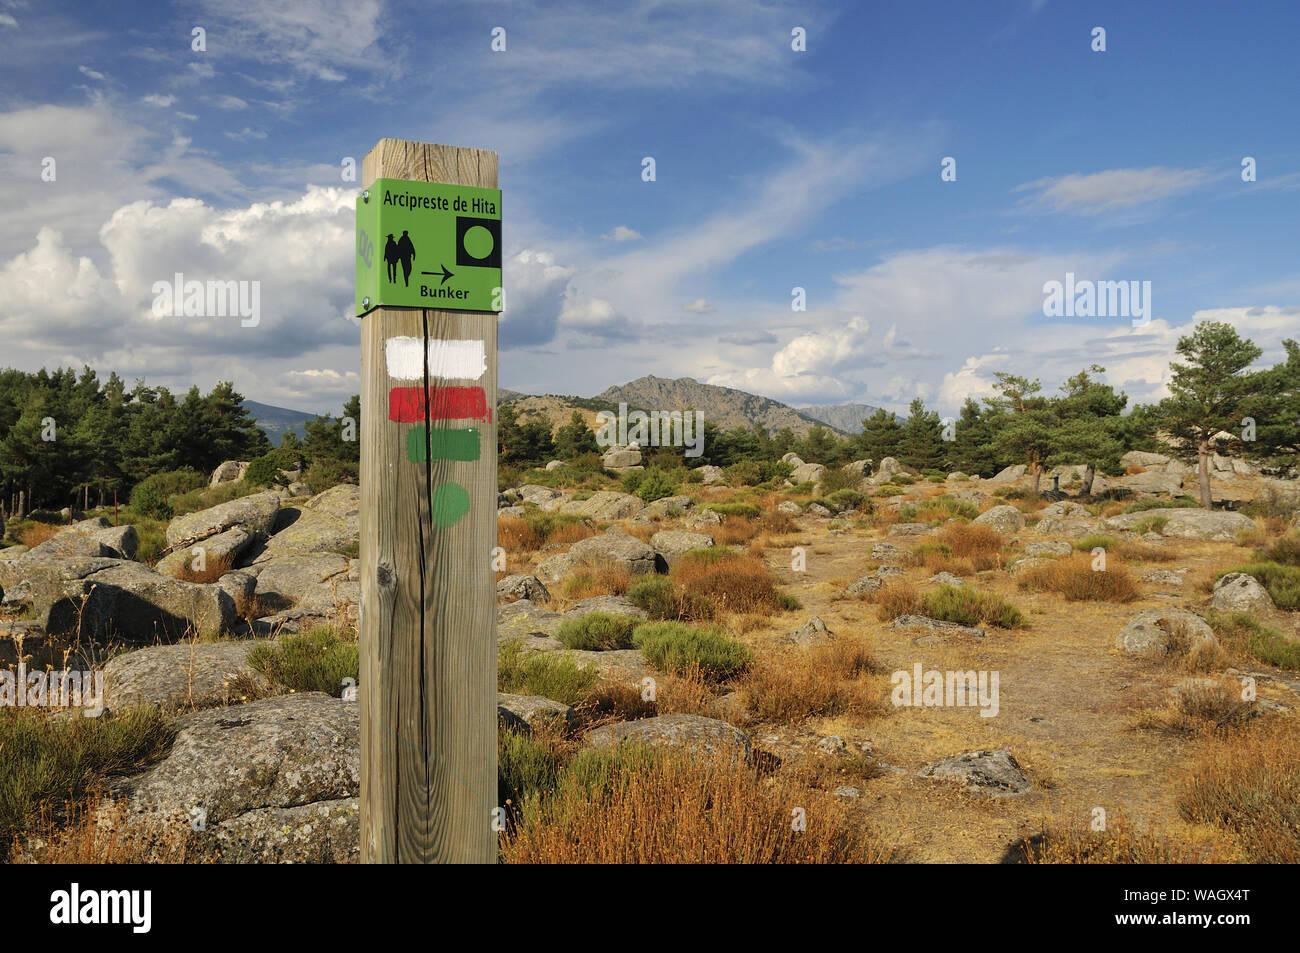 A signpost marking the Civil War bunker itinerary. La Sevillana Hill, Community of Madrid. Stock Photo